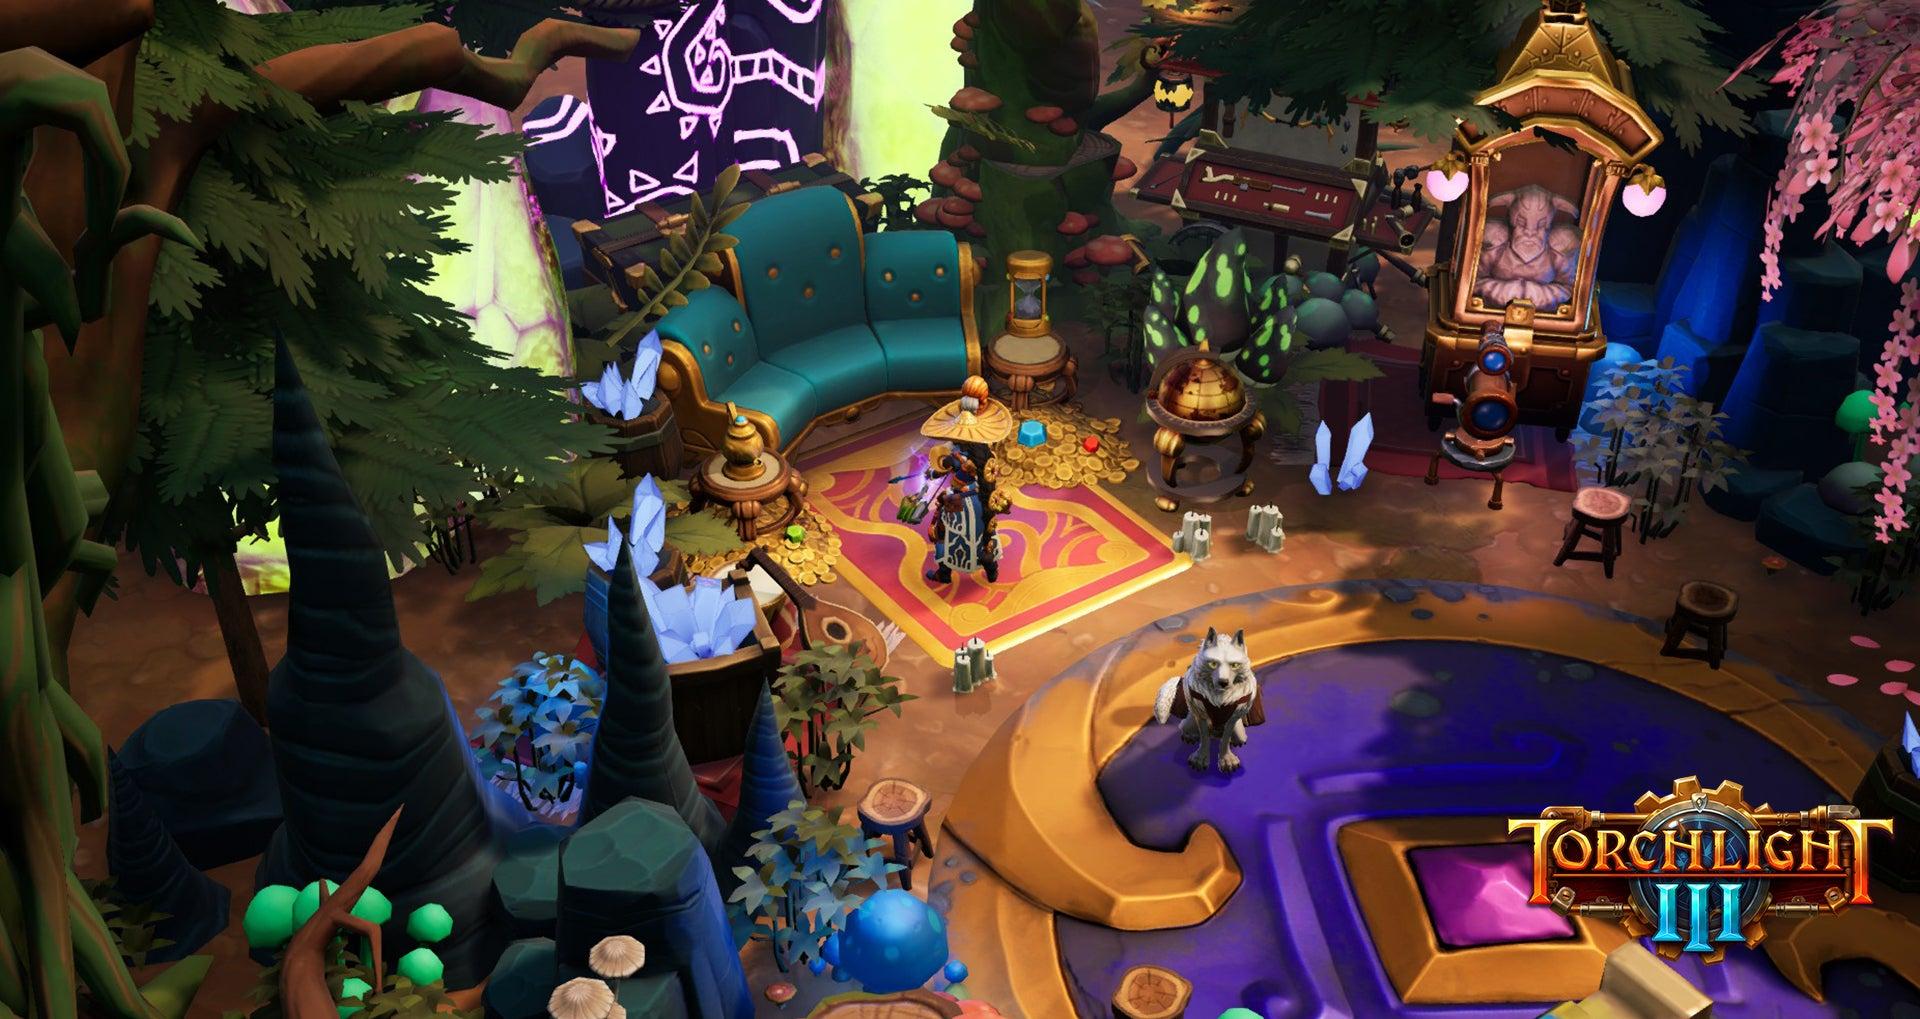 Screenshot of Torchlight III